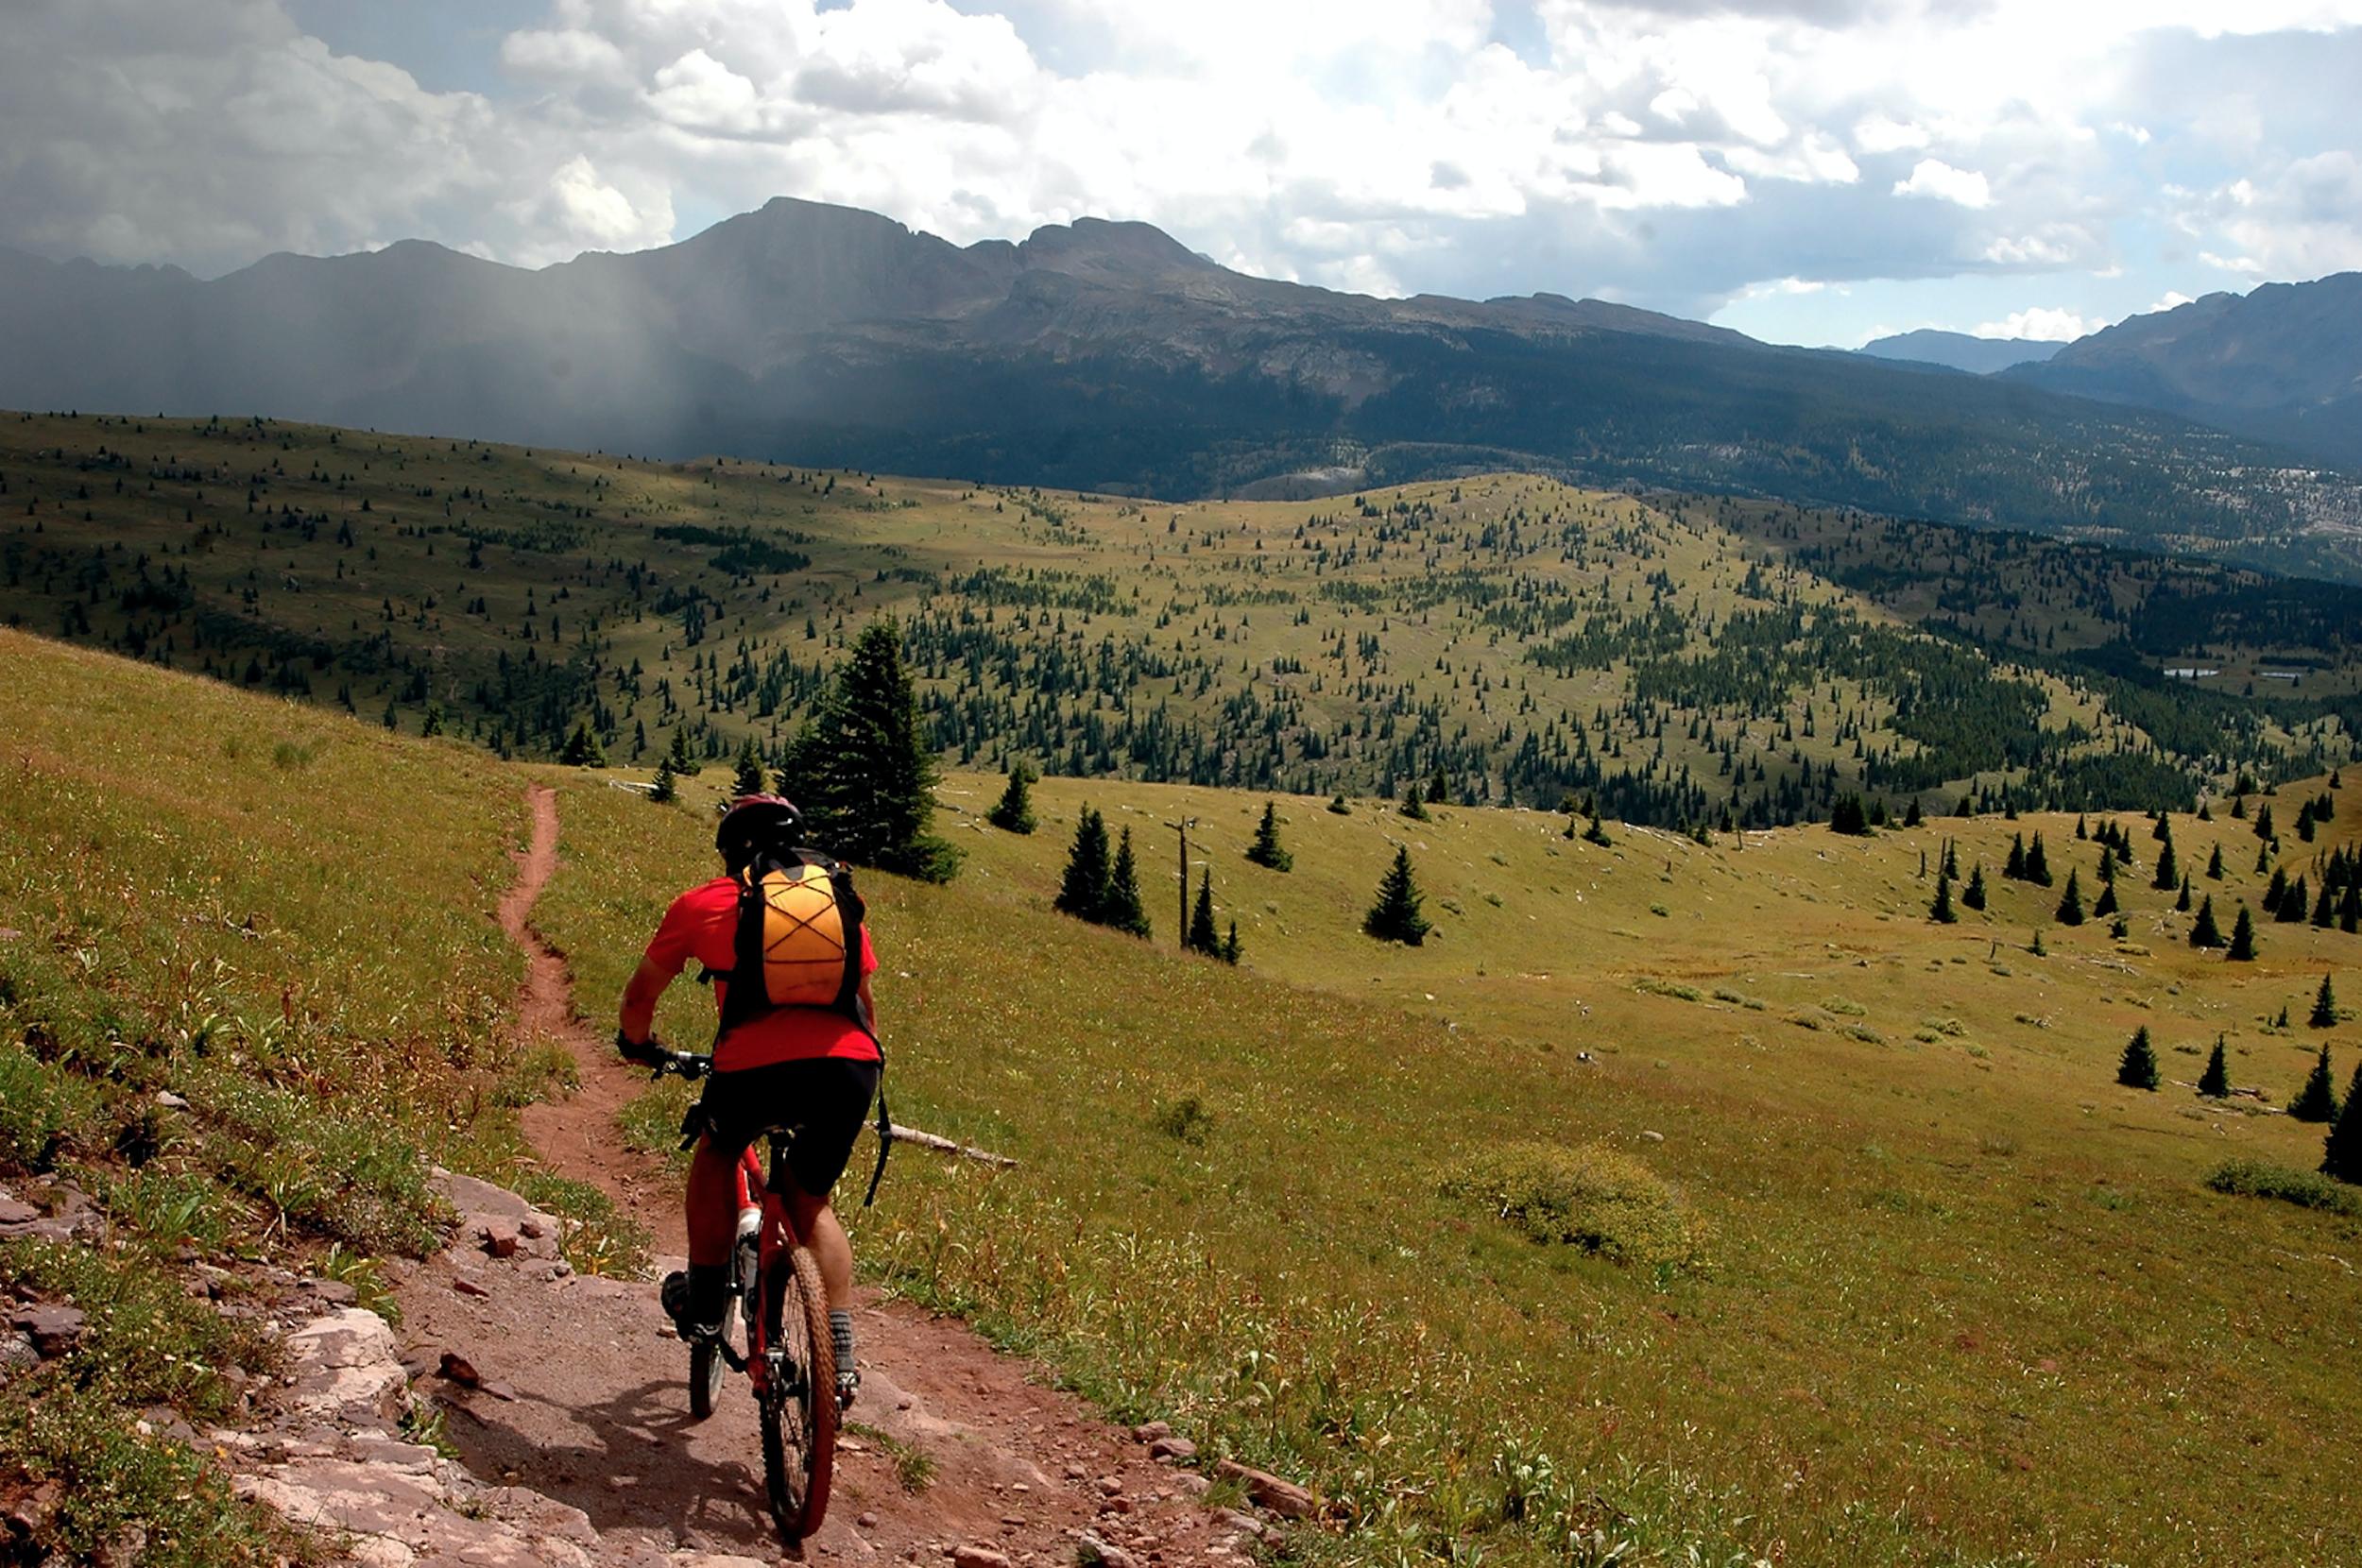 Mt Biking in the Wallowa Mountains